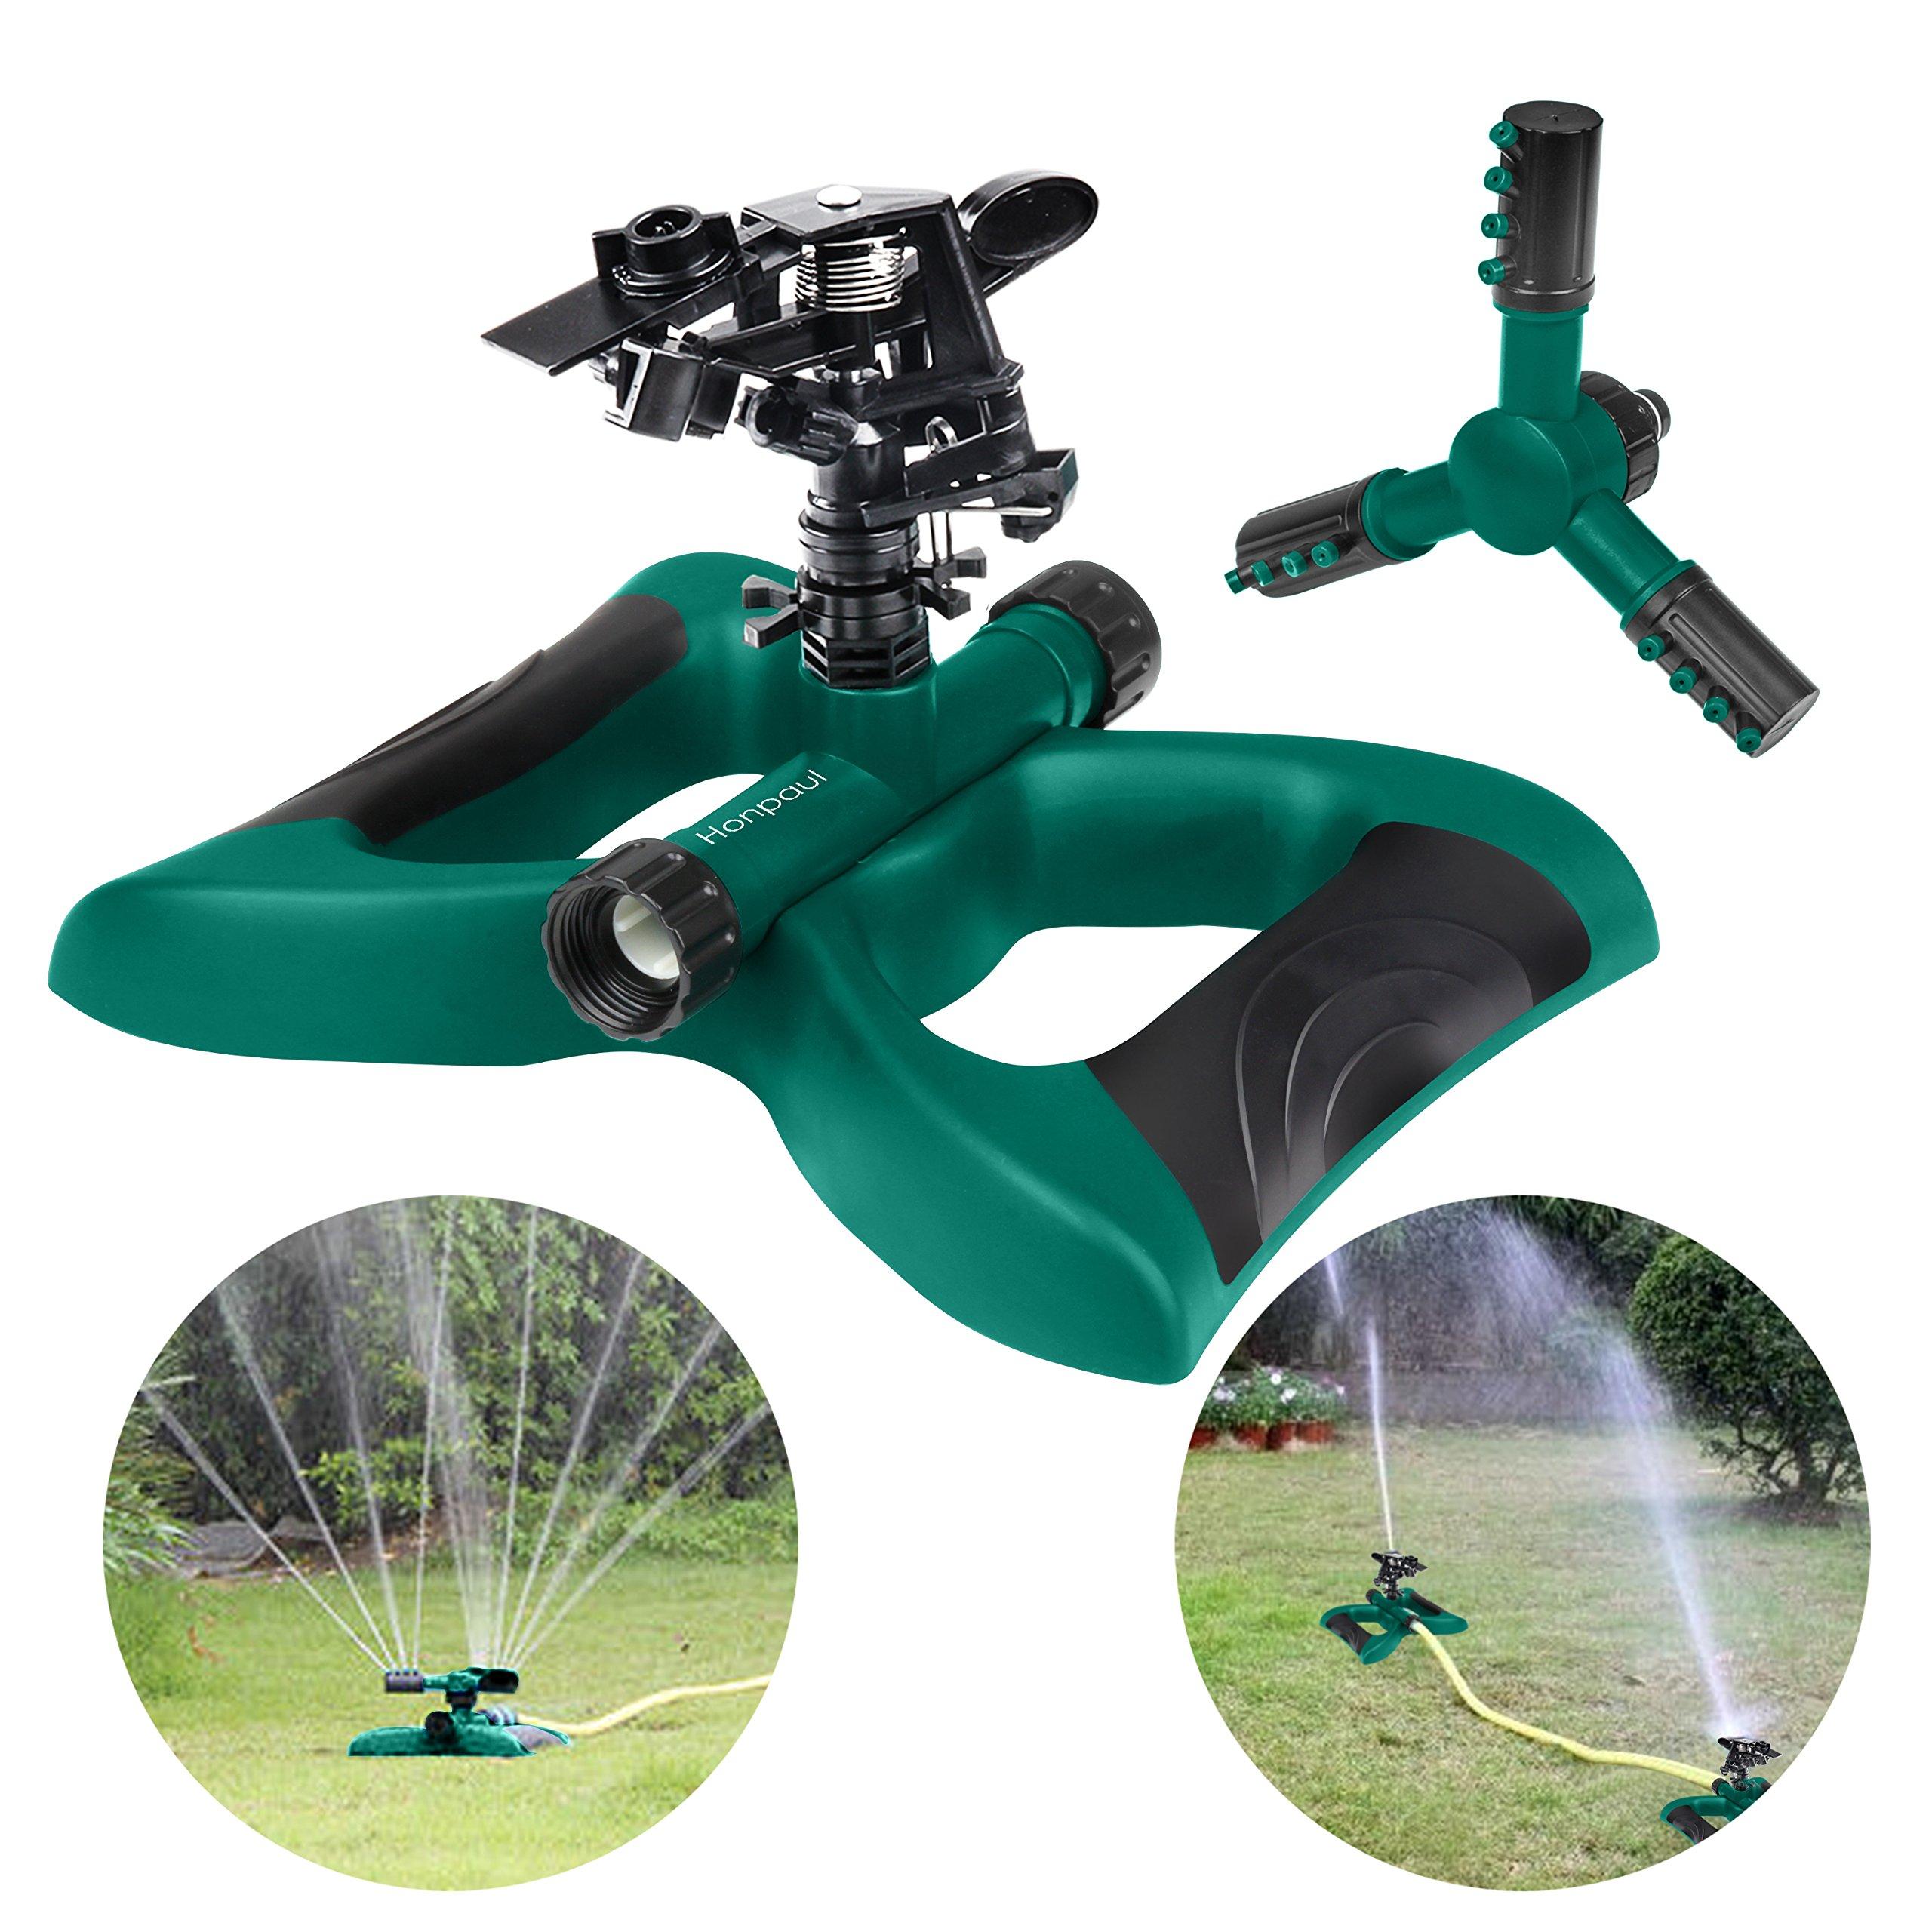 HonPaul Lawn Sprinkler,Impact Sprinker, 360 Degree Rotating Sprinkler Irrigation System, Used for Garden, Lawn Outdoor Automatic Sprinkler, Oscillating Rotary High Impact Sprinkler System,Sprinklers